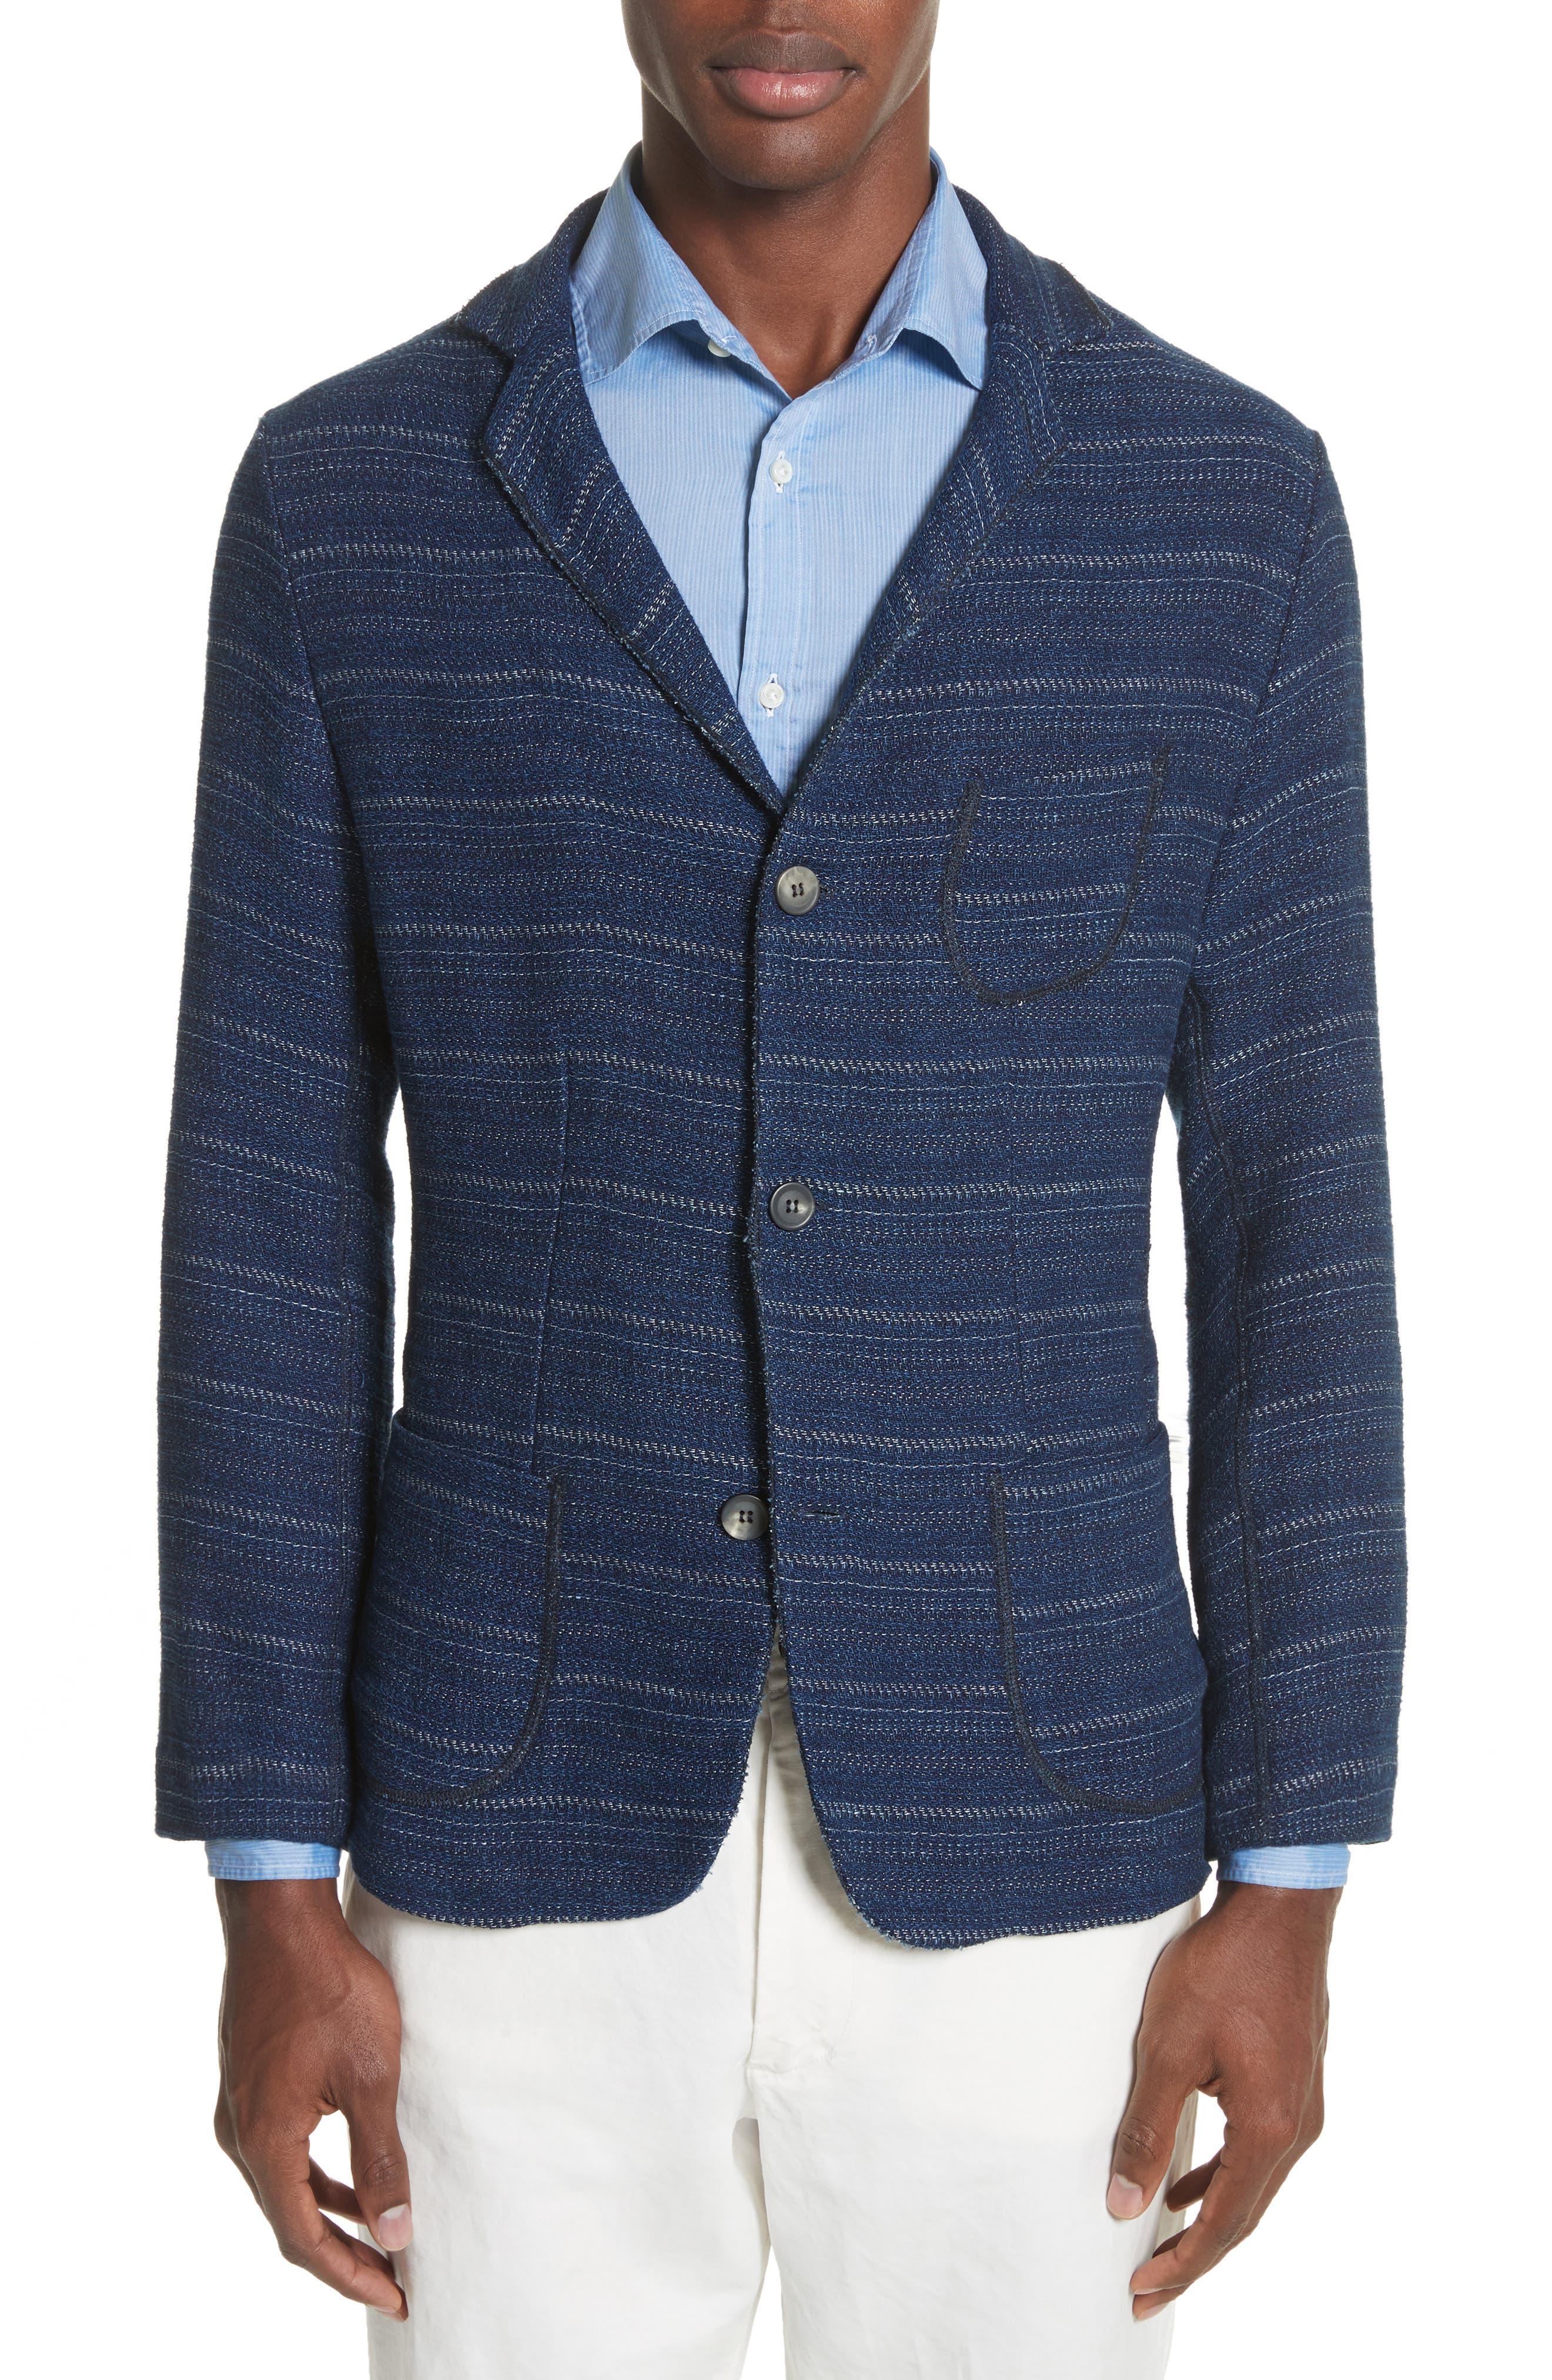 Napoli Nicola Barre Stripe Cotton & Linen Jacket,                         Main,                         color, 410